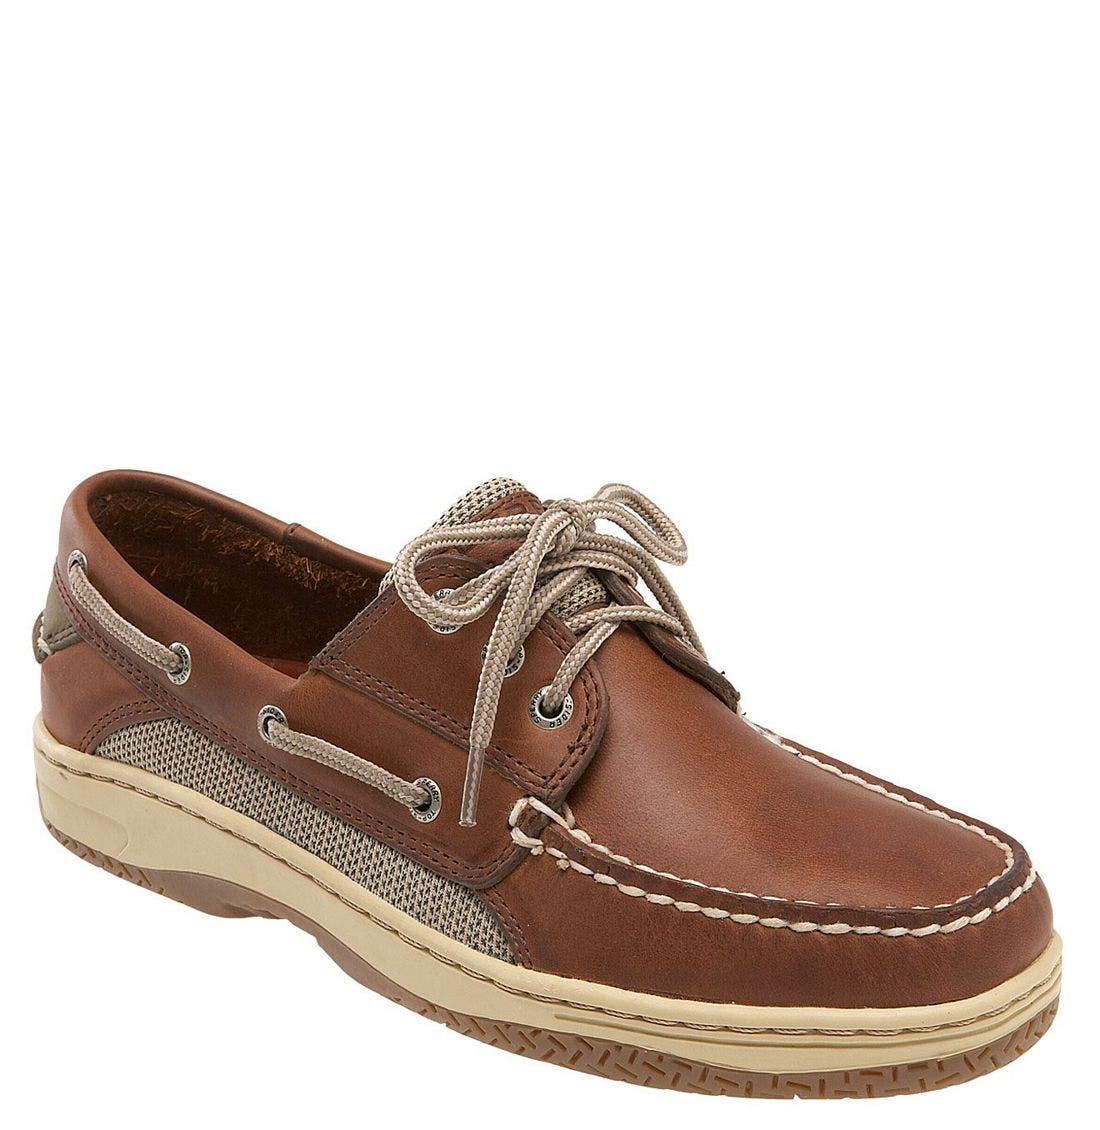 Main Image - Sperry 'Billfish' Boat Shoe (Men)